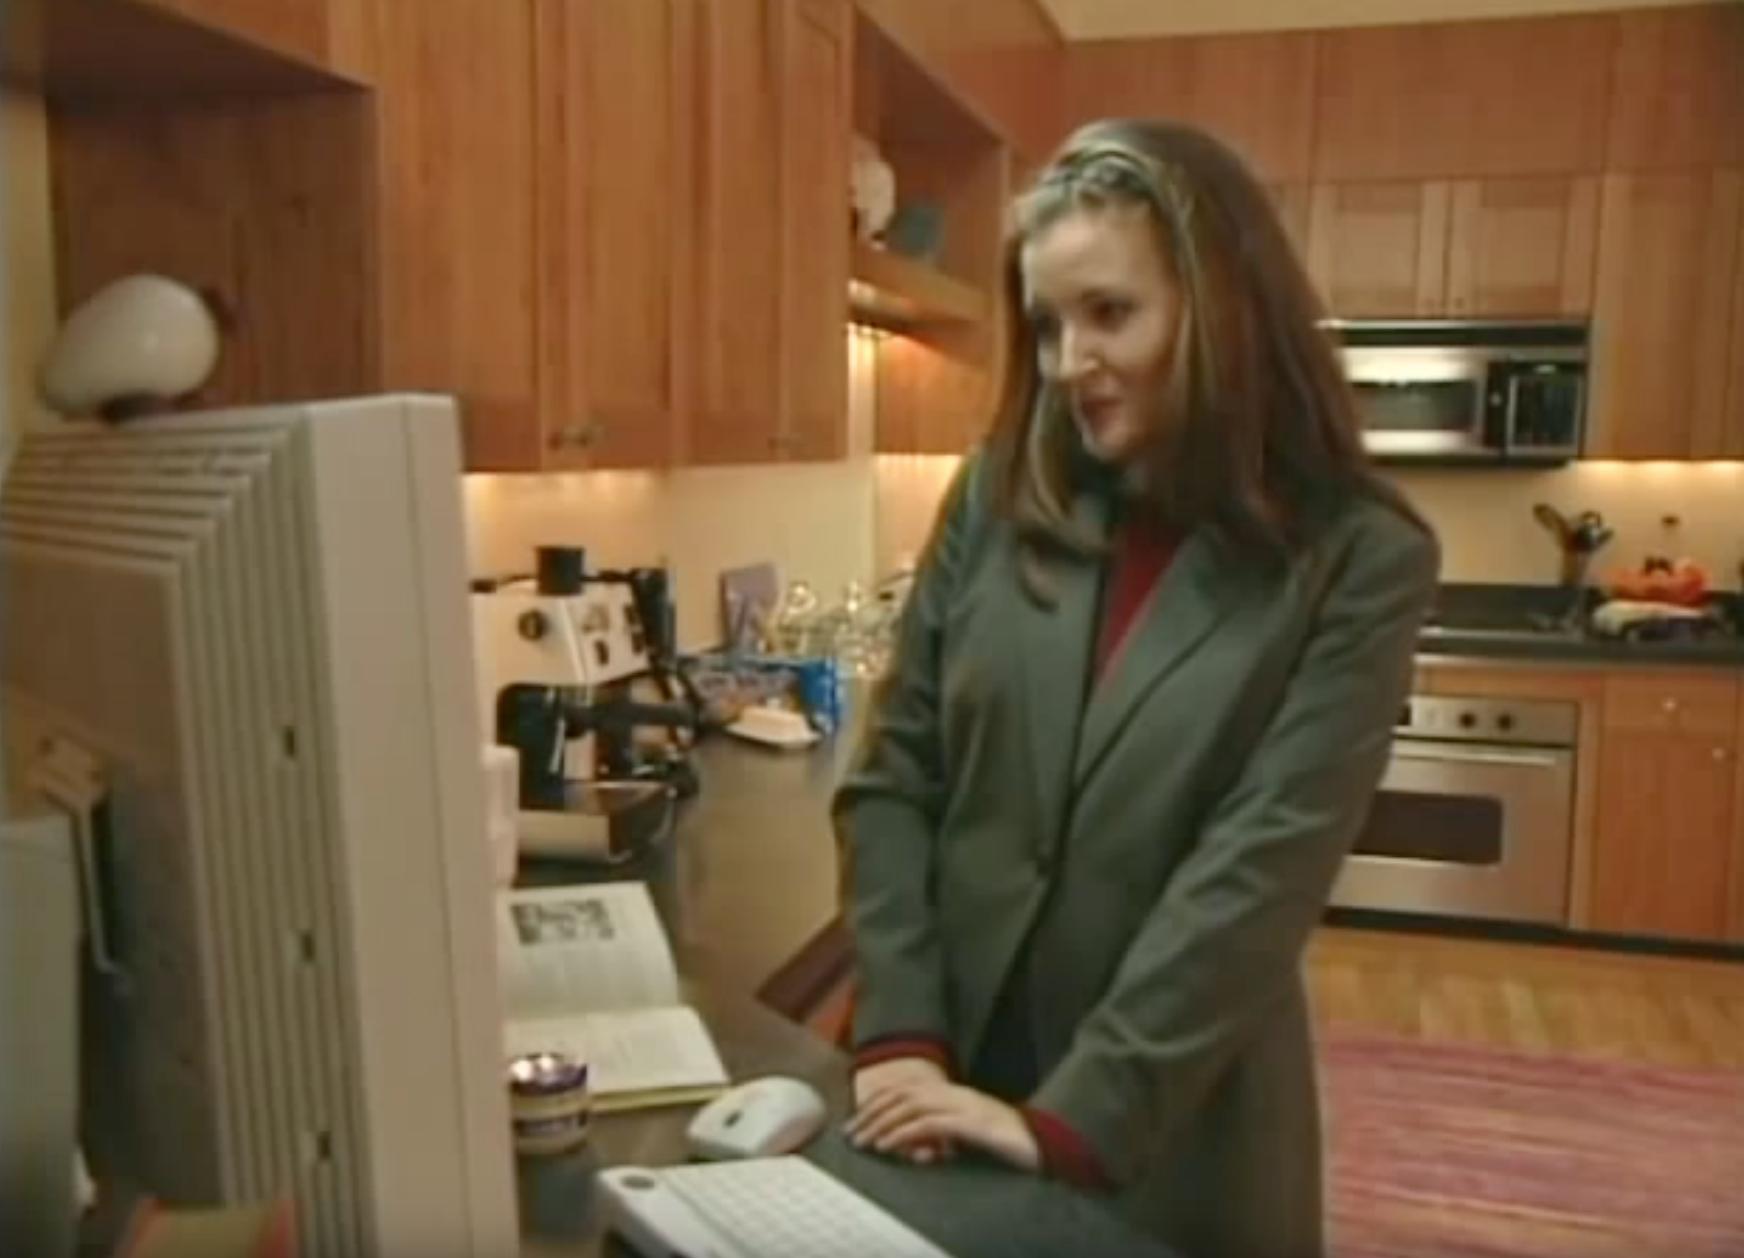 Microsoft's Home of the Future – in 1999